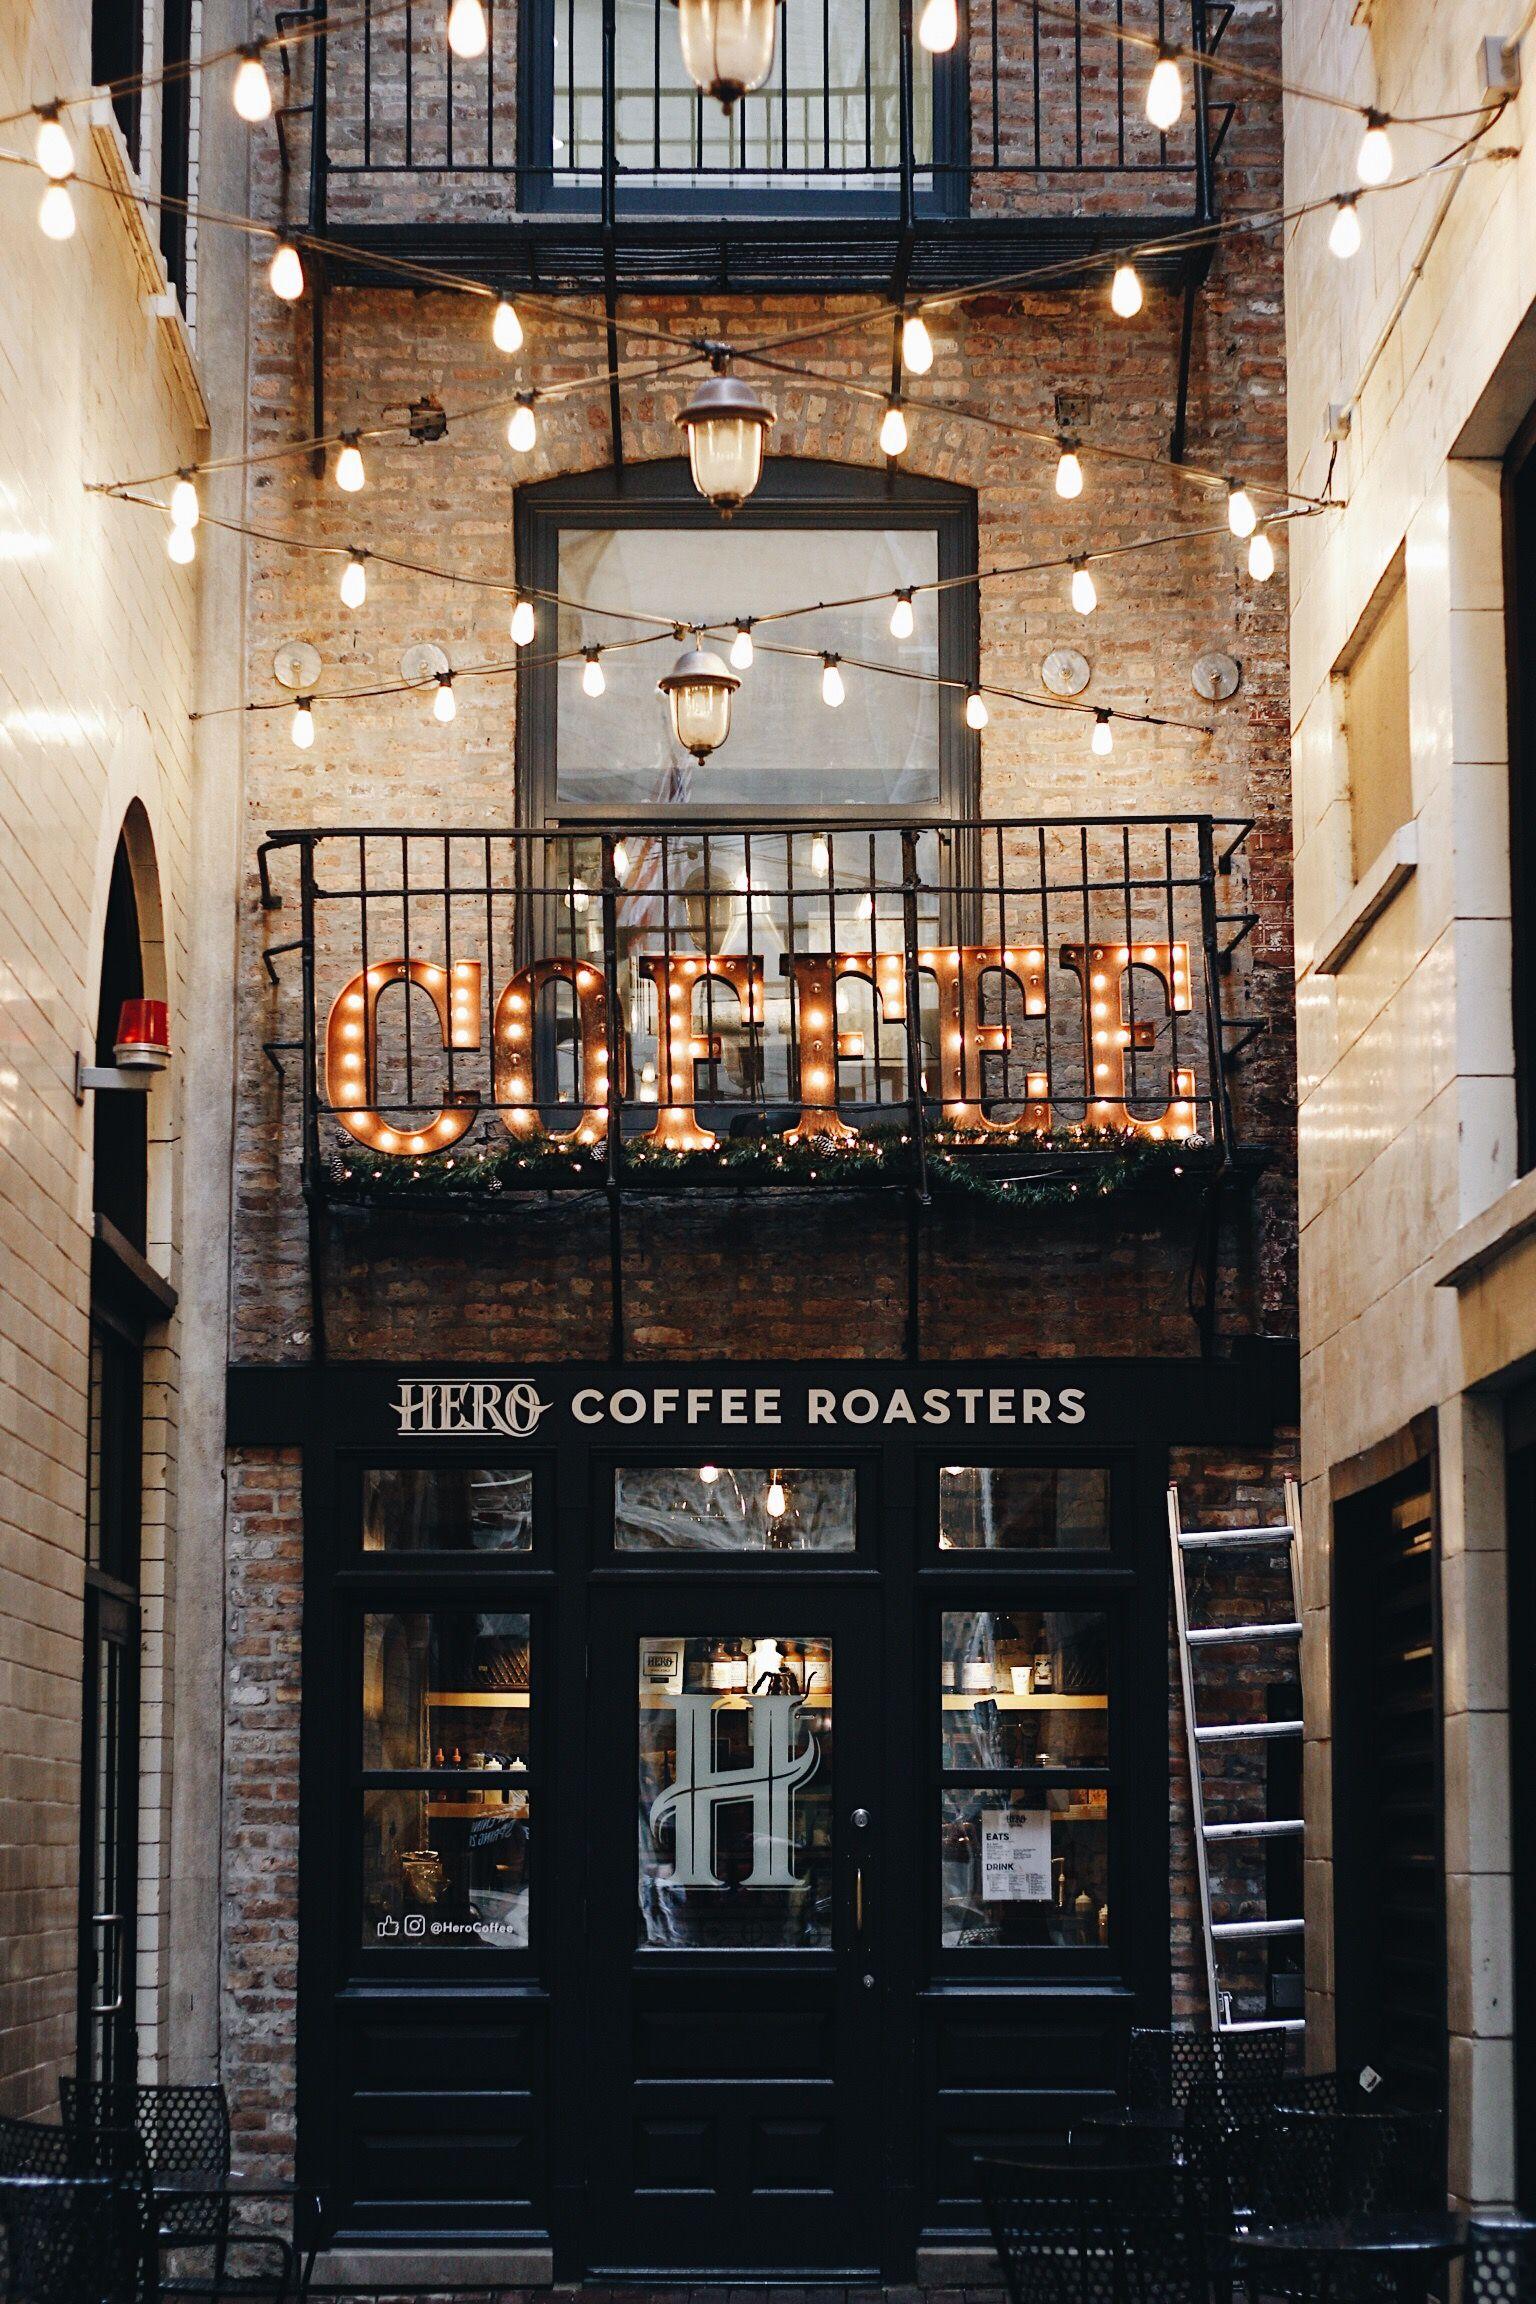 Hero Coffee Chicago Coffee Shop Hero Coffee Chicago Photography Aesthetic City City Lights Coffee Shop Chicago Coffee Shops Coffee Shop Aesthetic